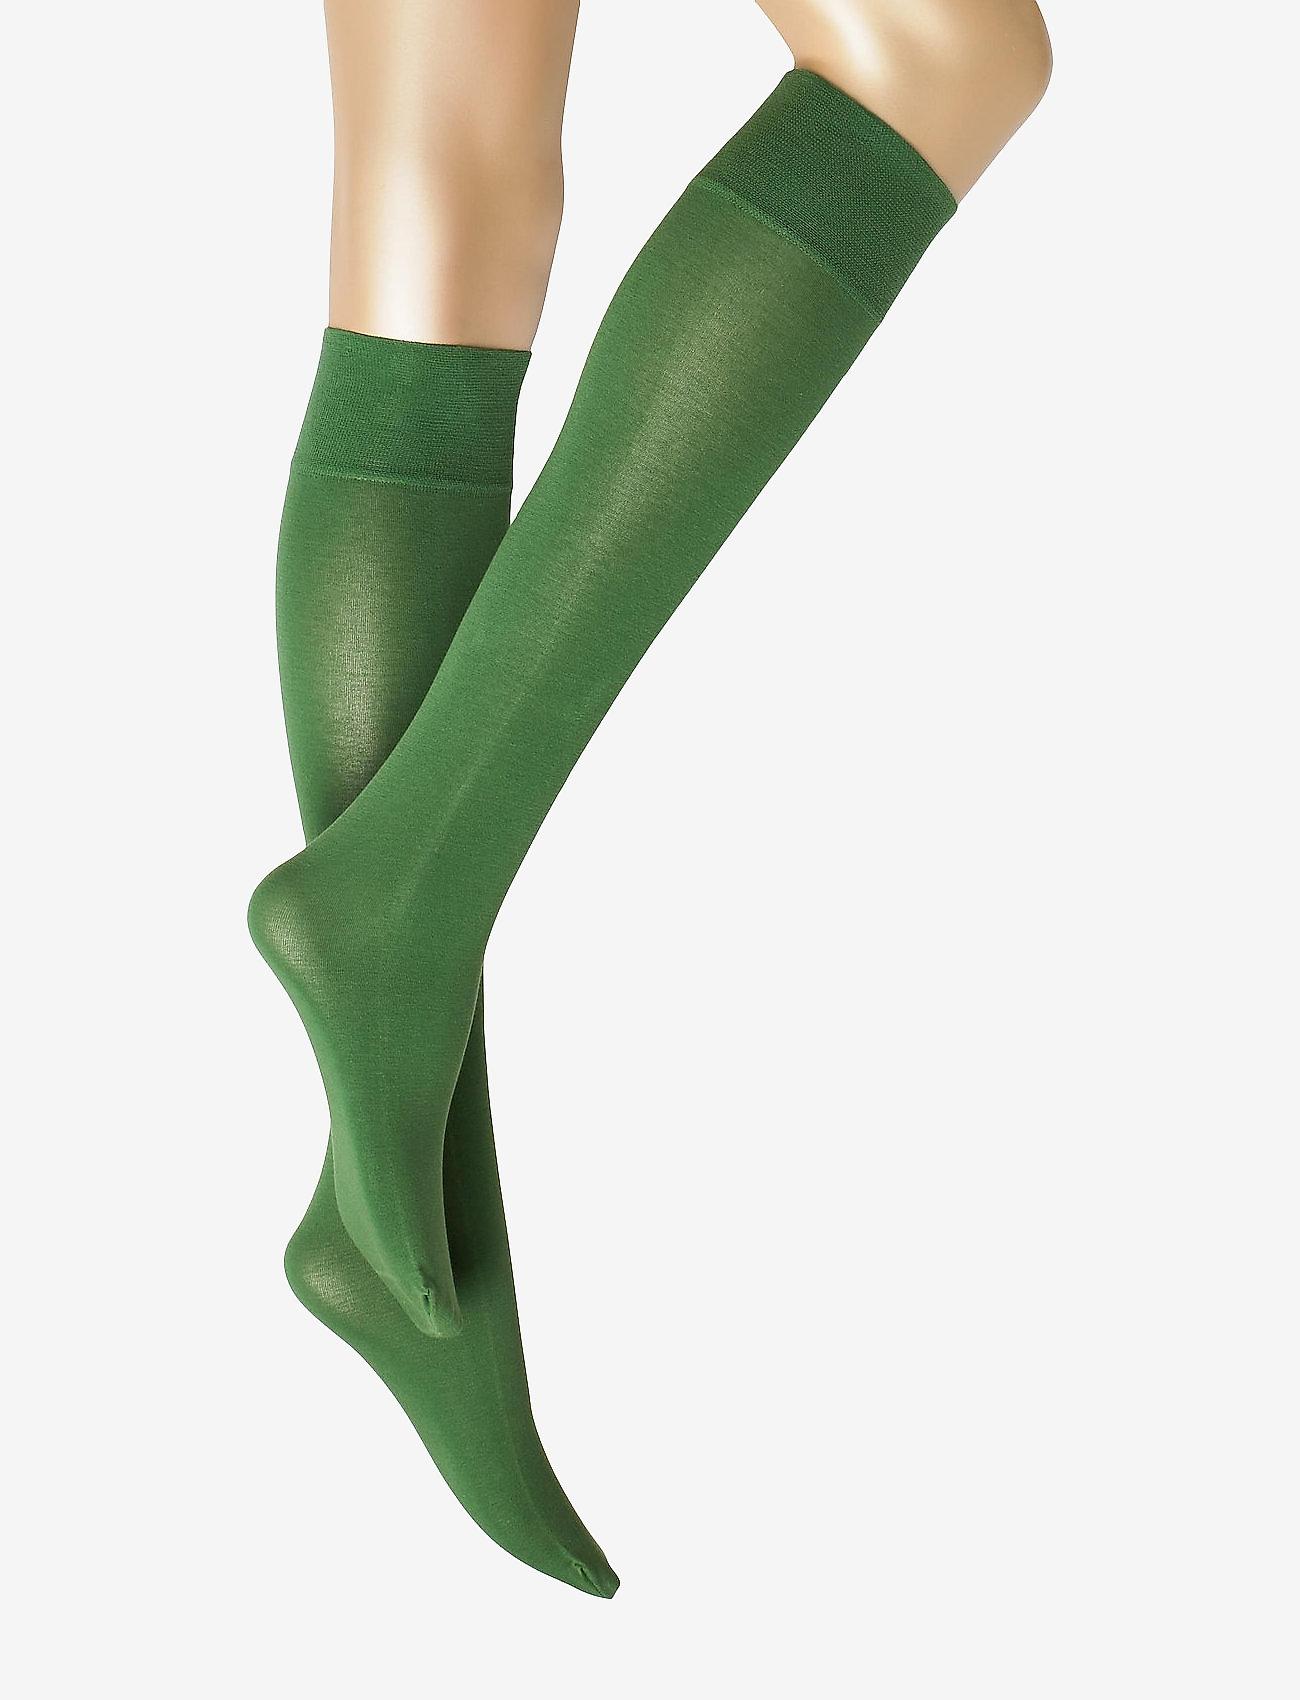 Vogue - Ladies knee high, Silky Cotton Knee - knee-highs - green - 0